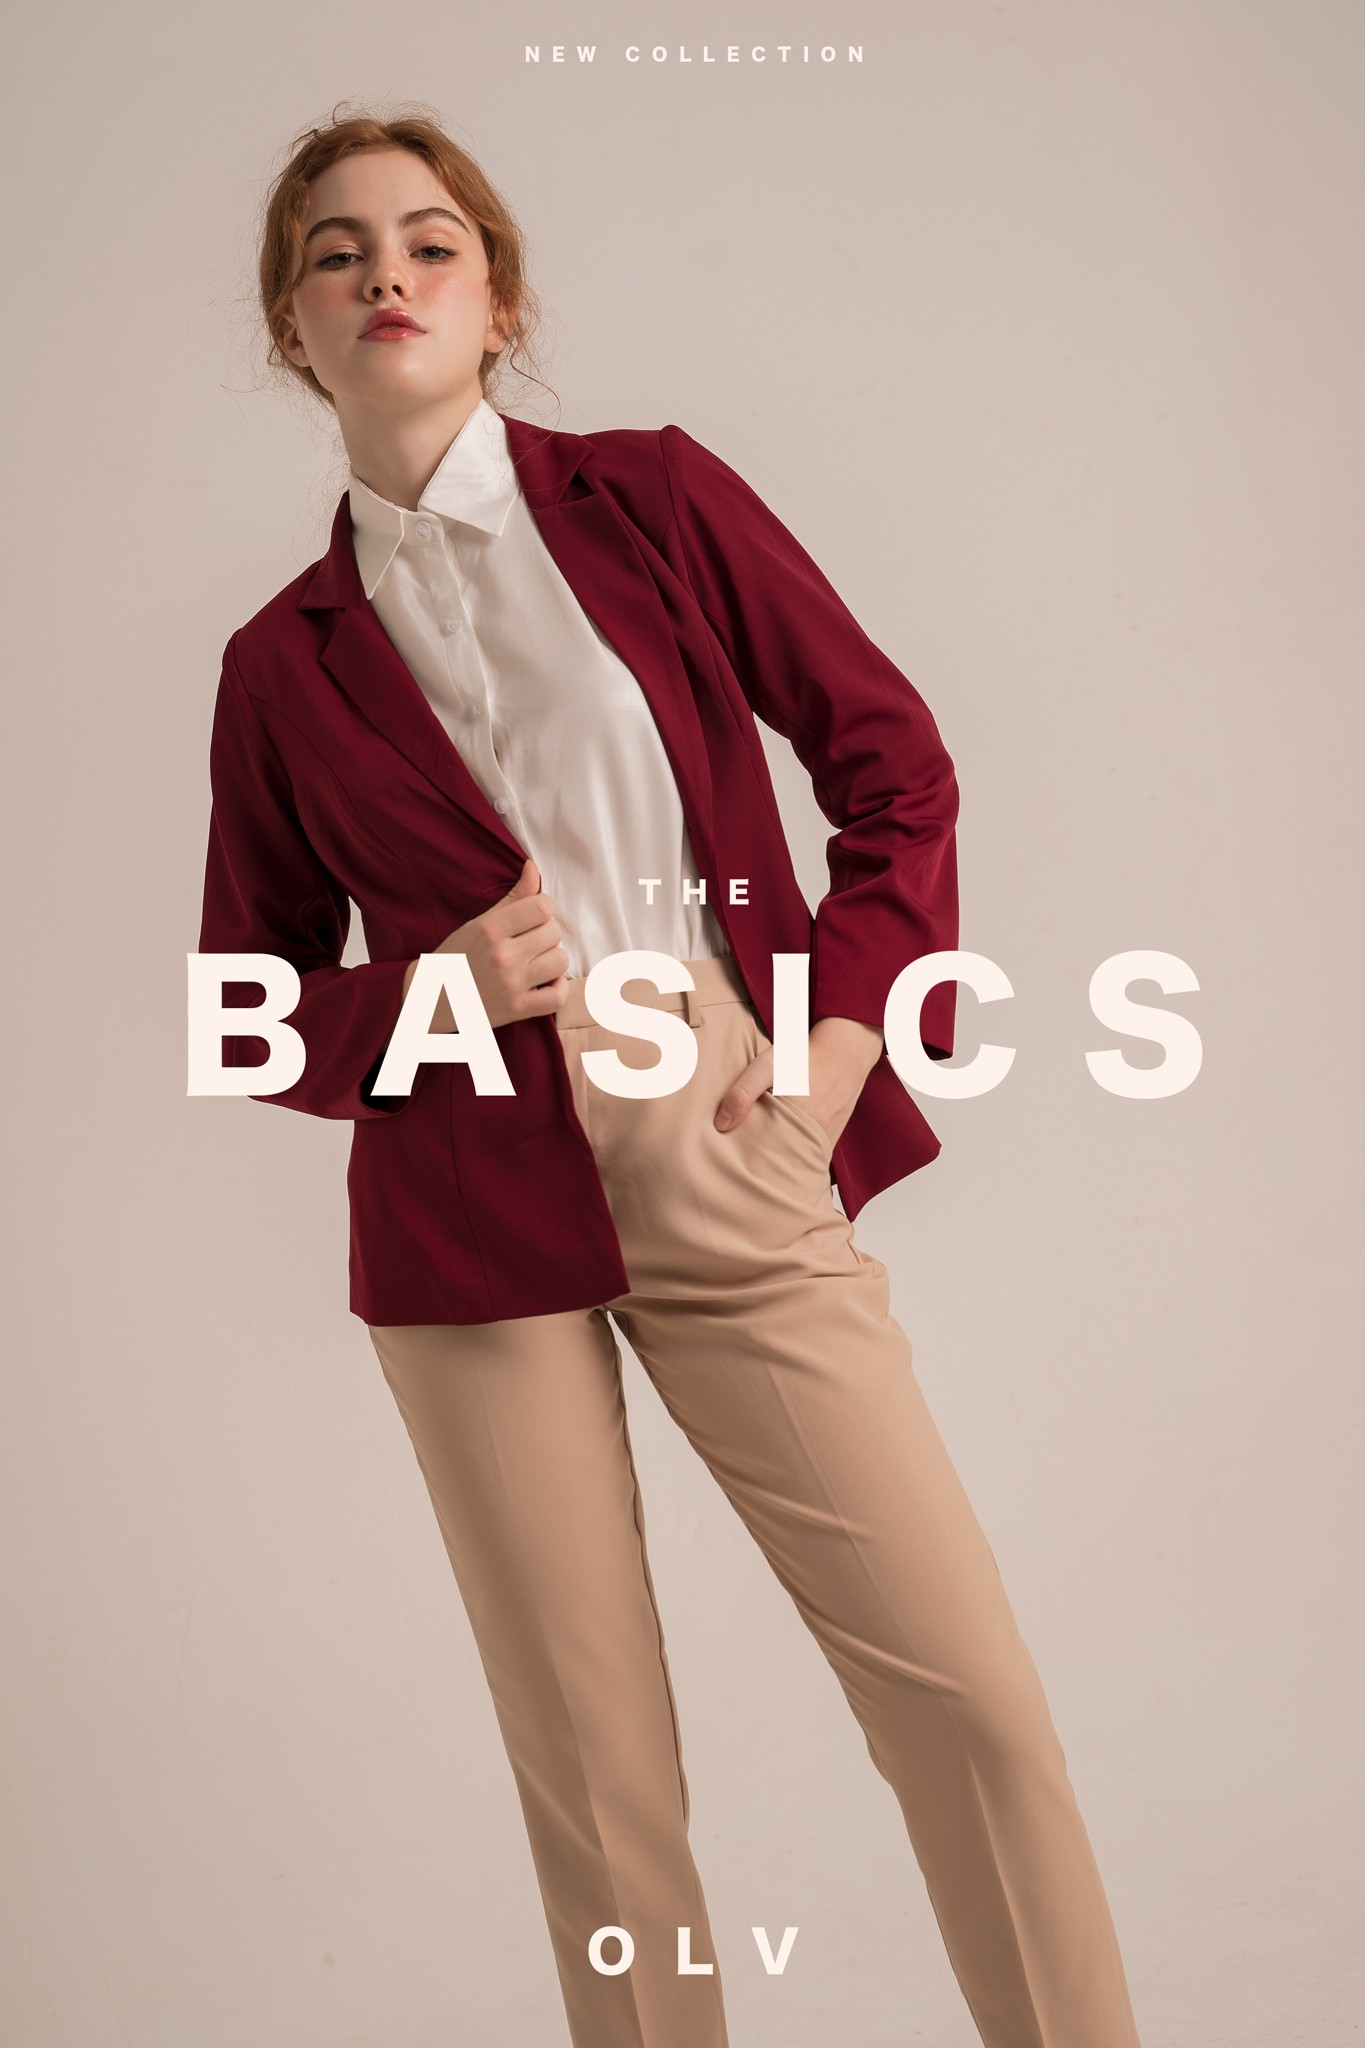 olv the basics